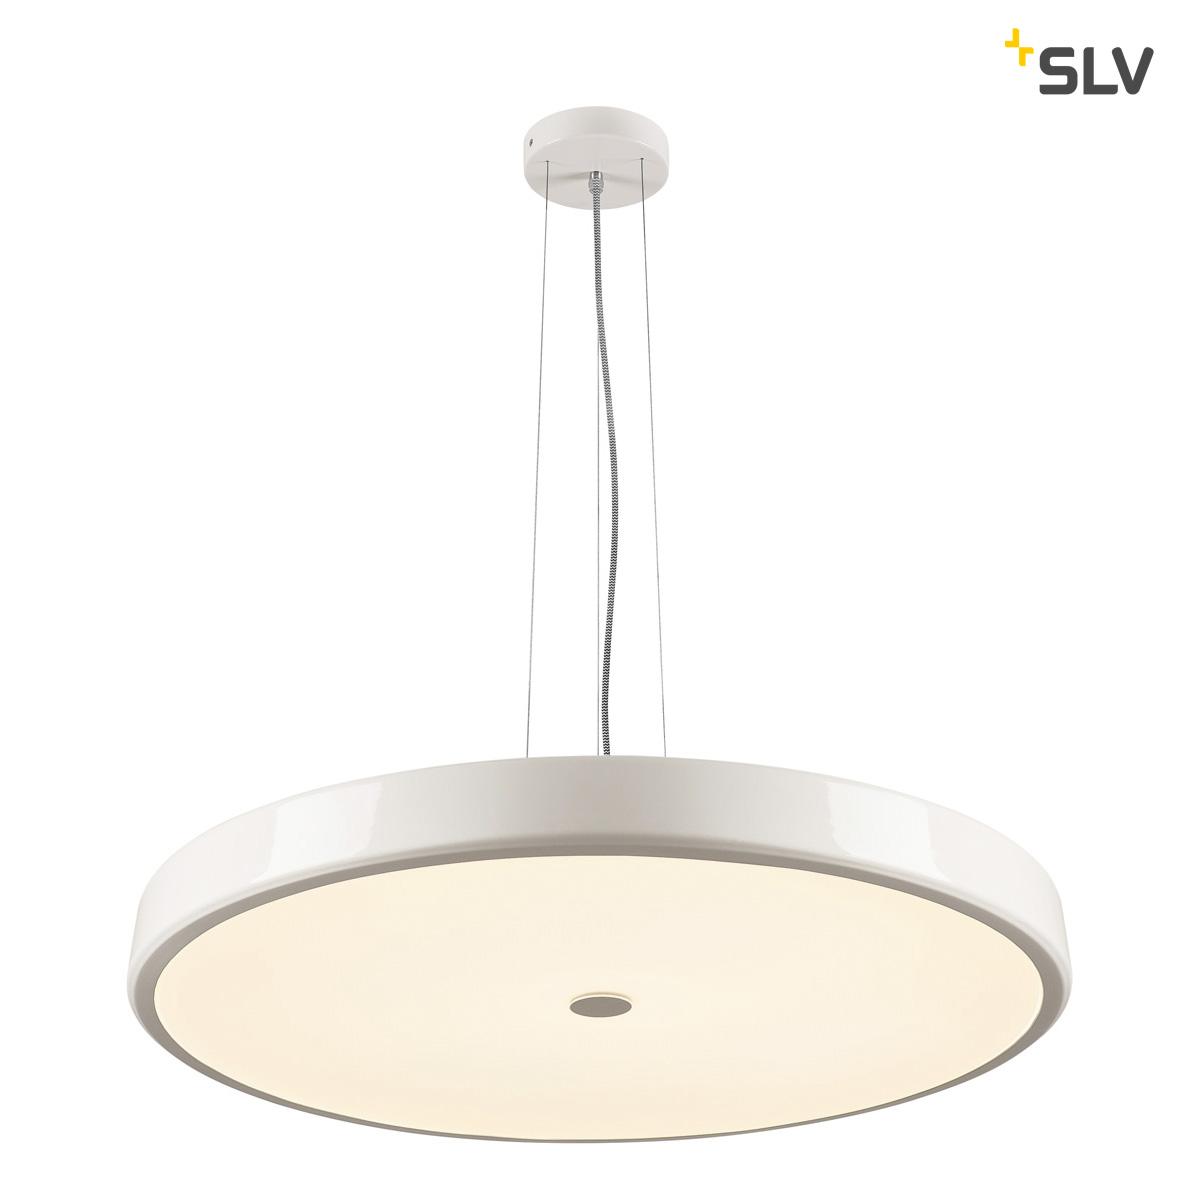 slv 133351 sphera pendelleuchte led 2700k rund wei gefrostetes acrylglas 75cm. Black Bedroom Furniture Sets. Home Design Ideas